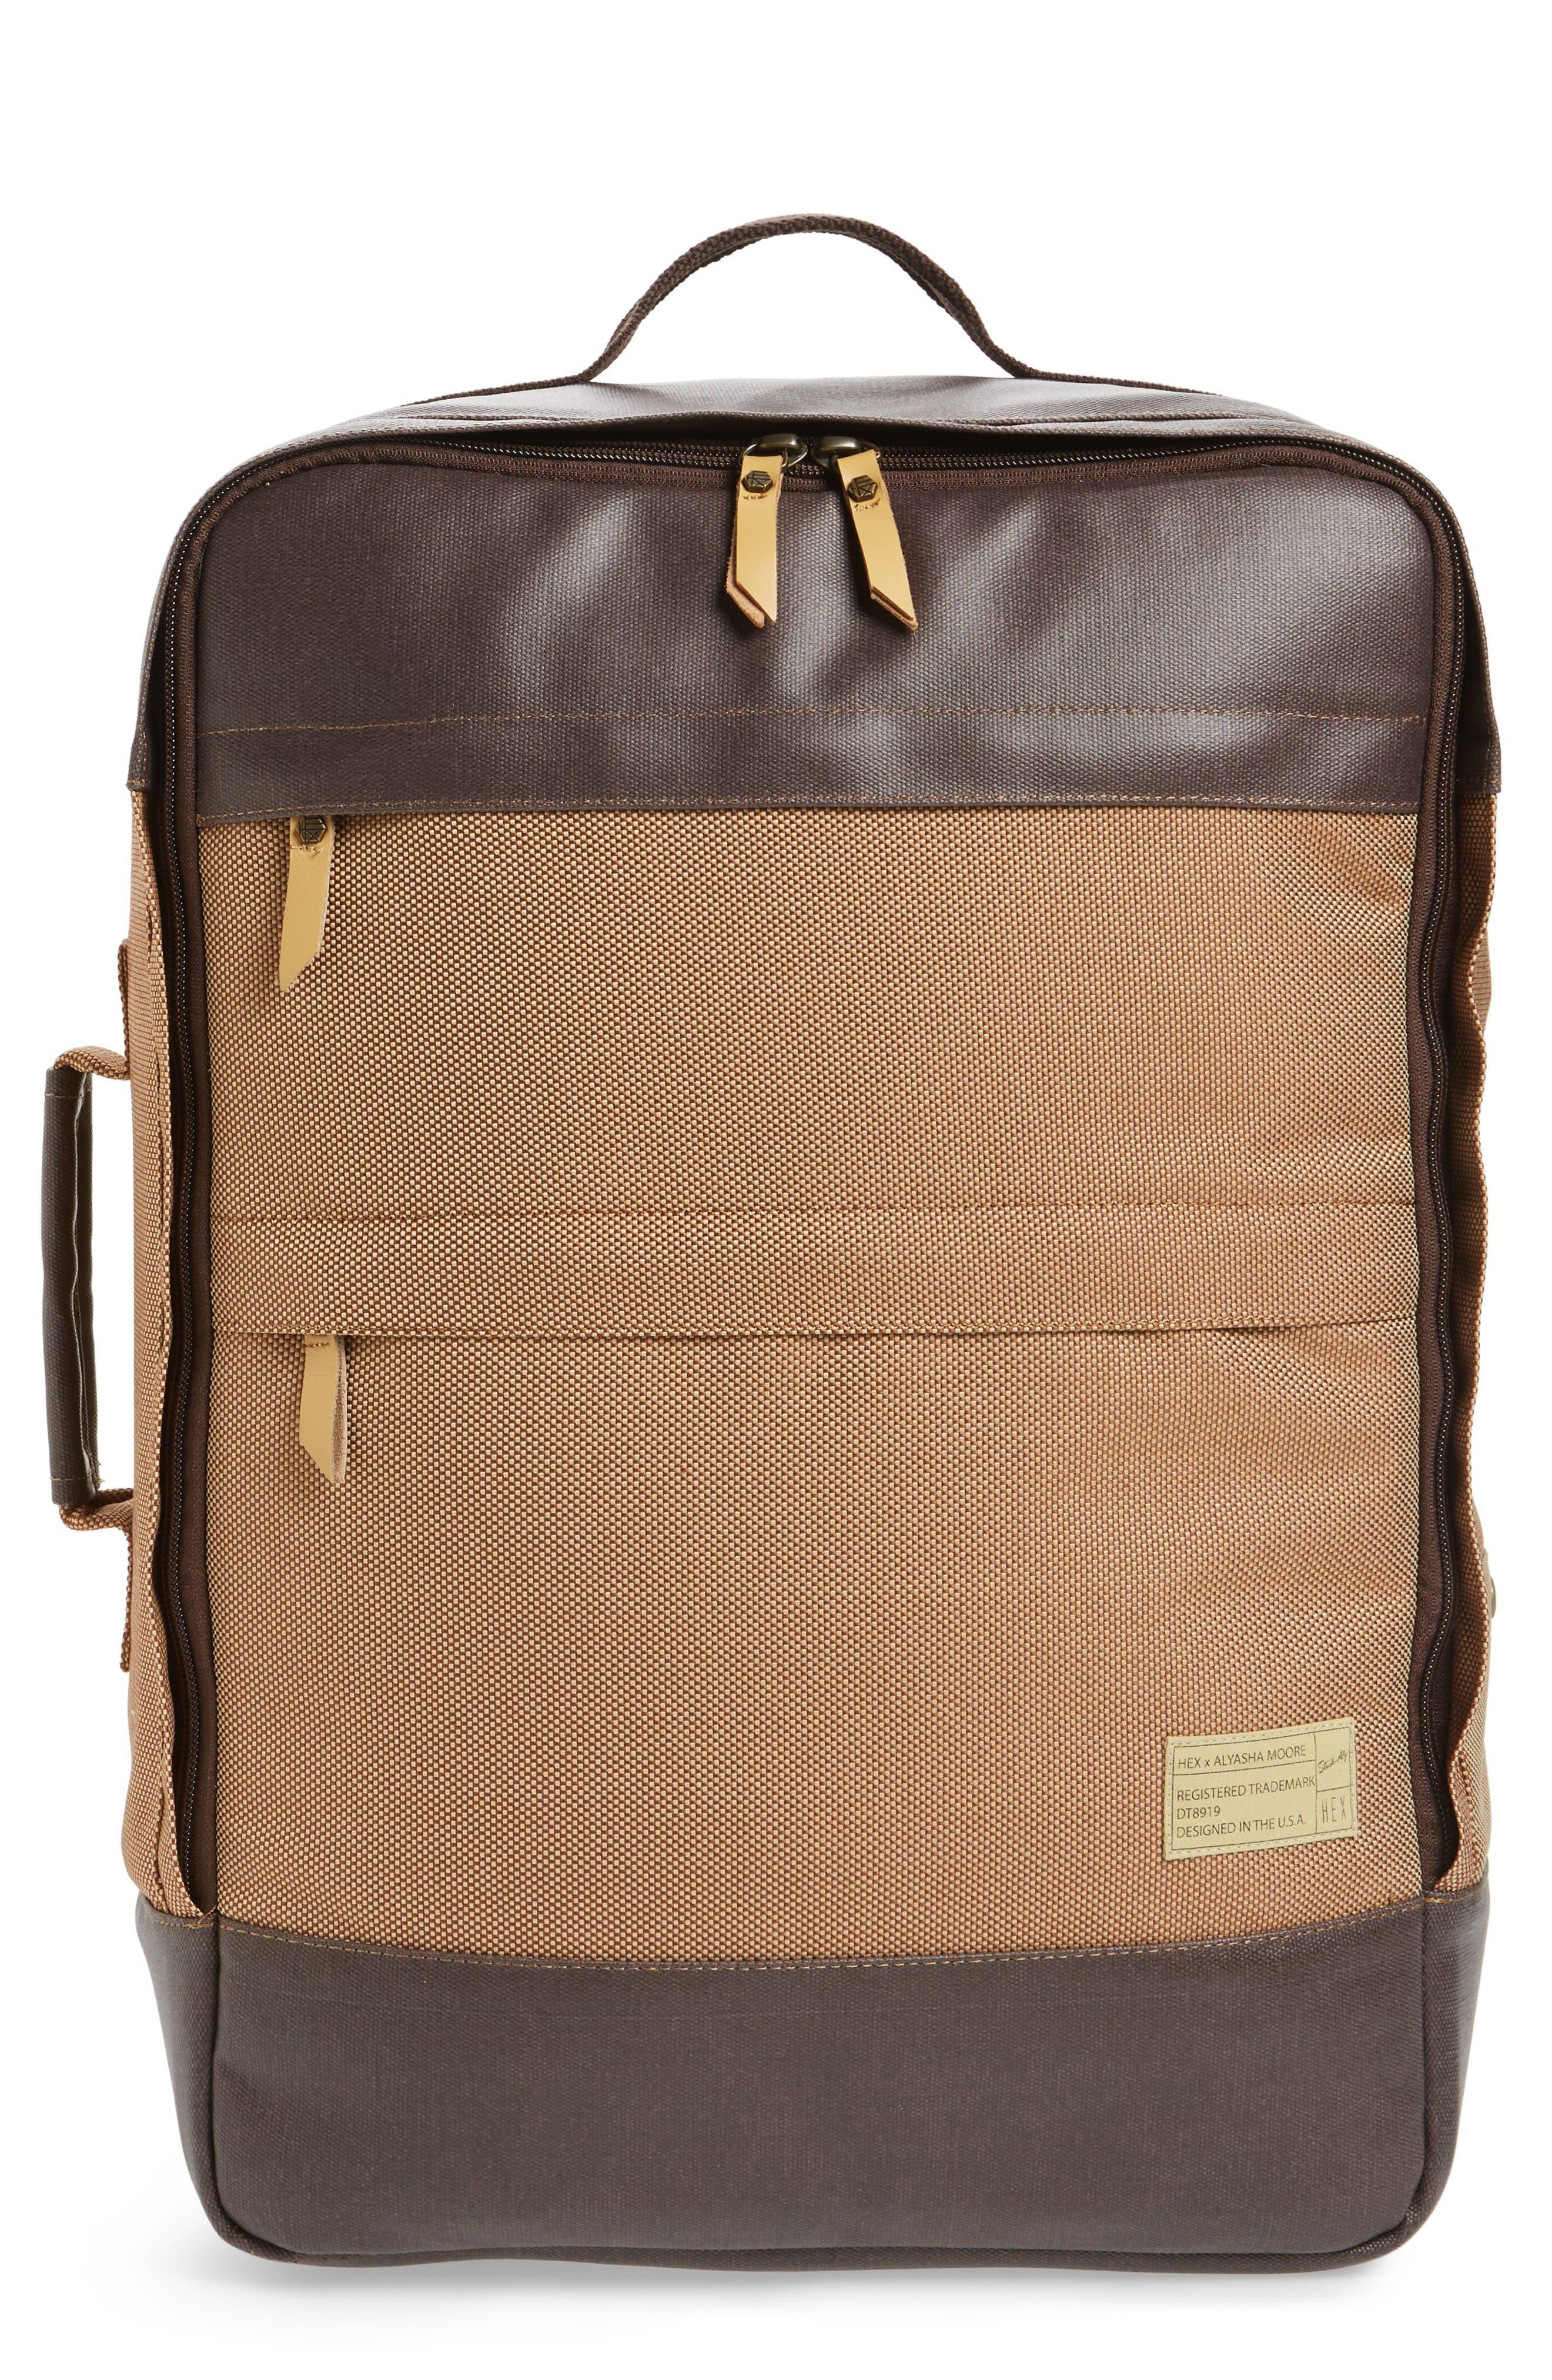 Alternate Image 1 Selected - HEX Alyasha Travel Backpack